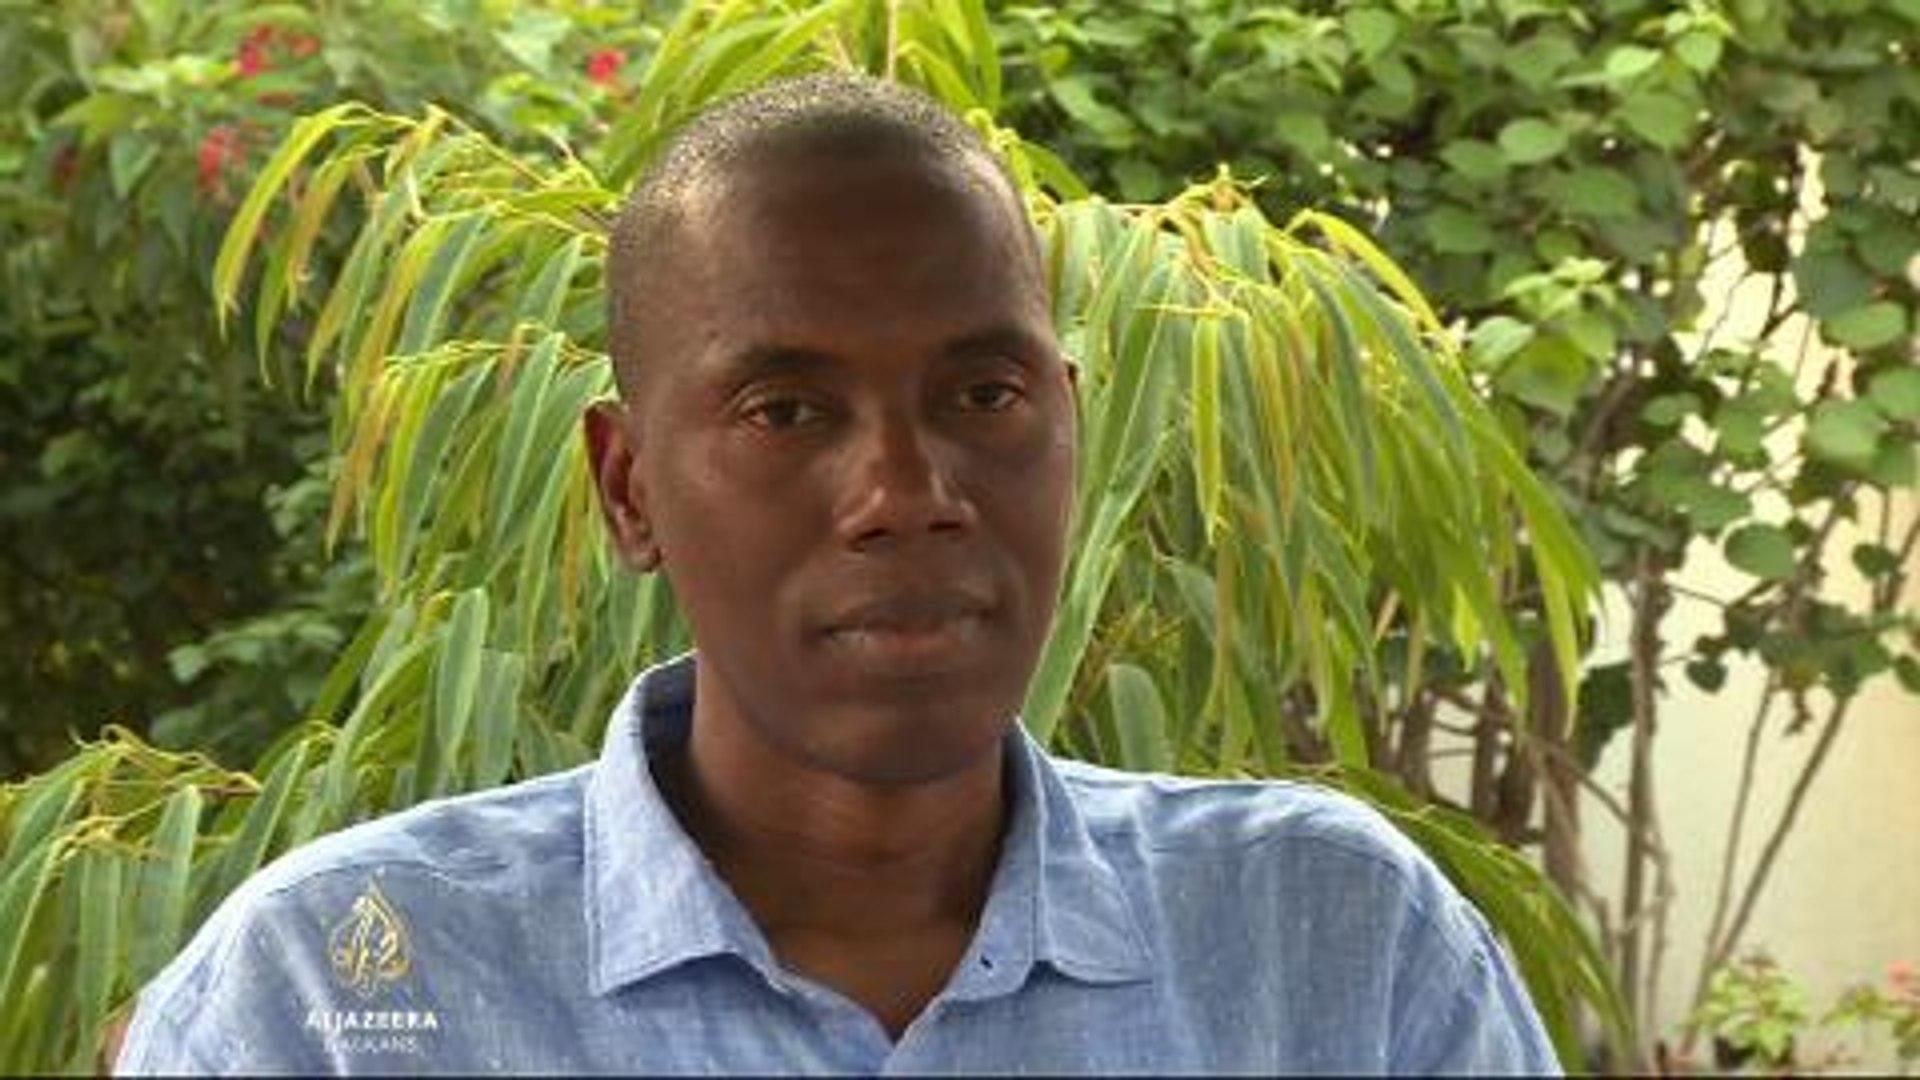 romeo romeo i juliet u Nigeriji asansol dating girl